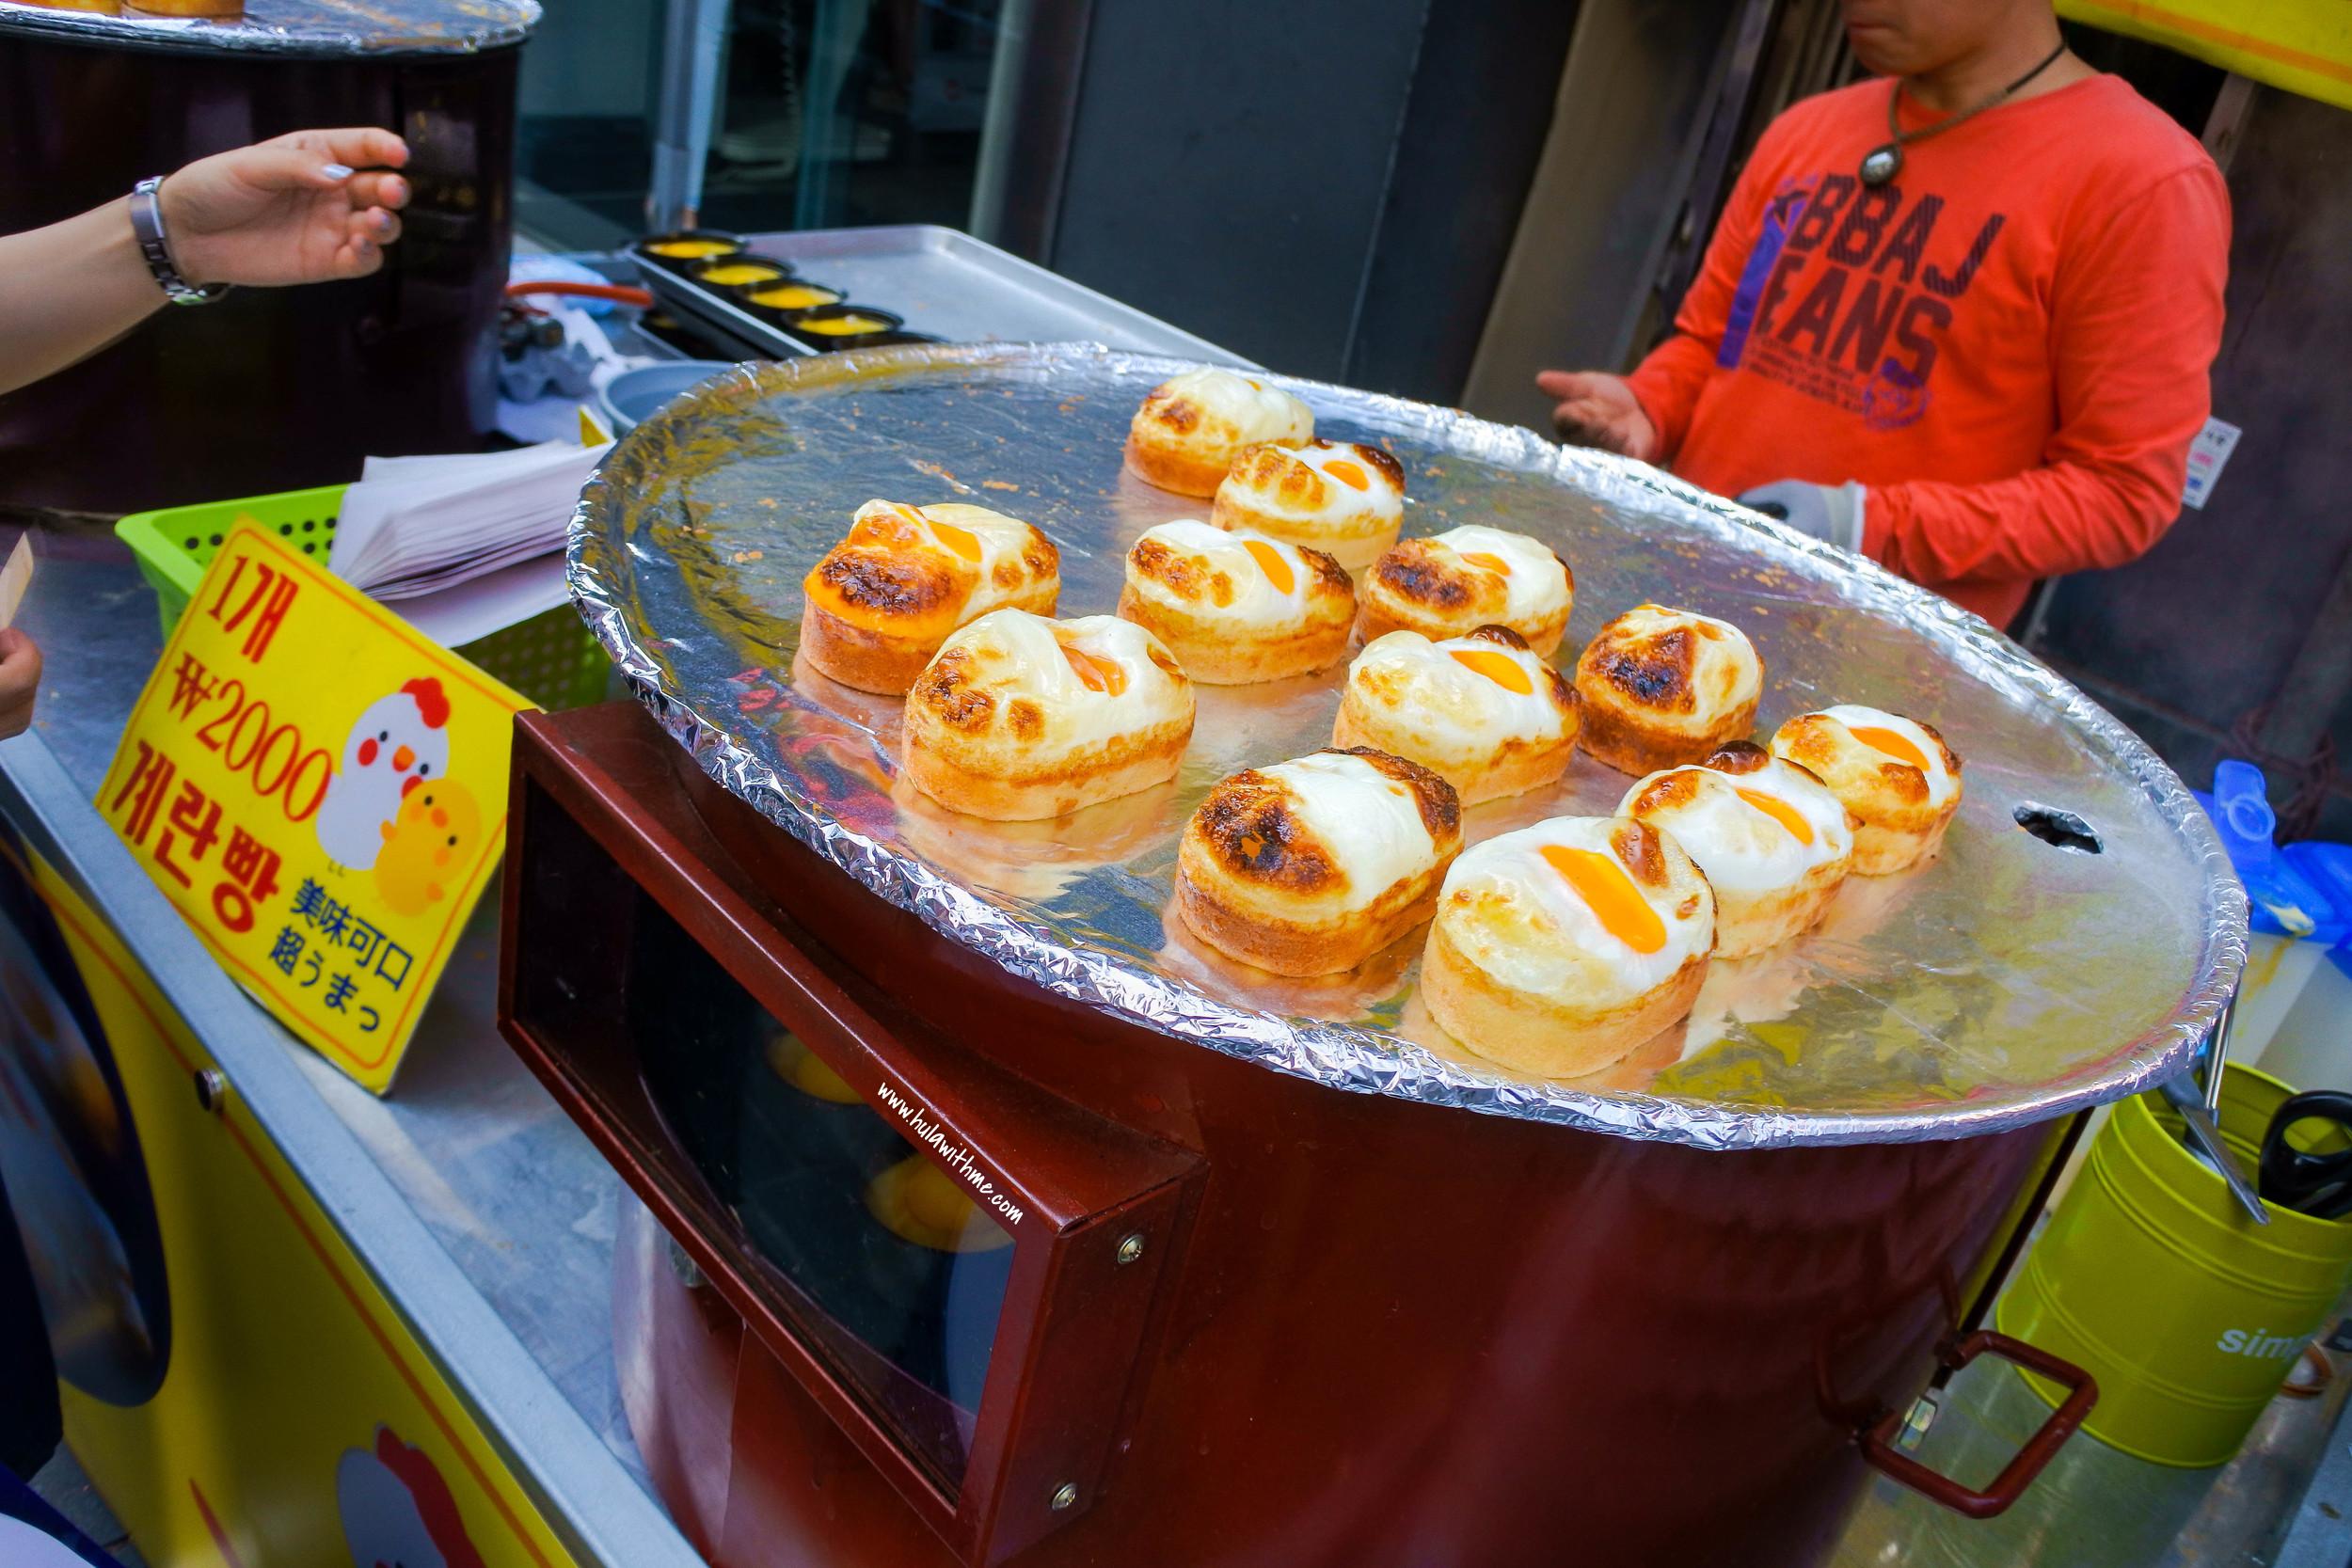 Seoul street food - The Egg Bread